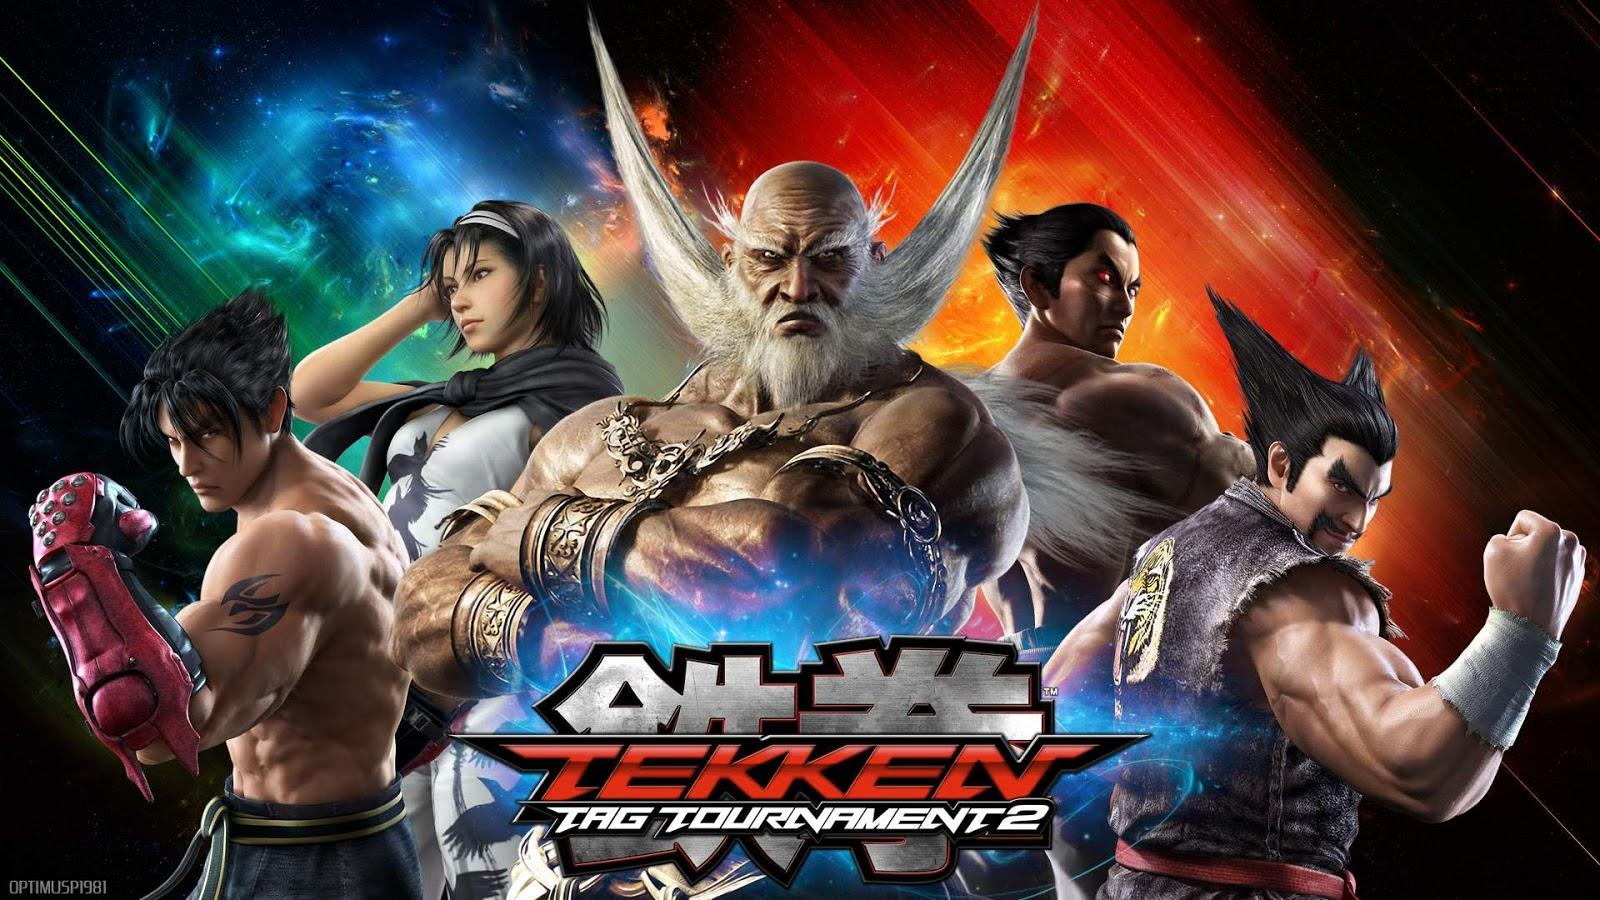 Tekken tag tournament 1 download for pc apunkagames